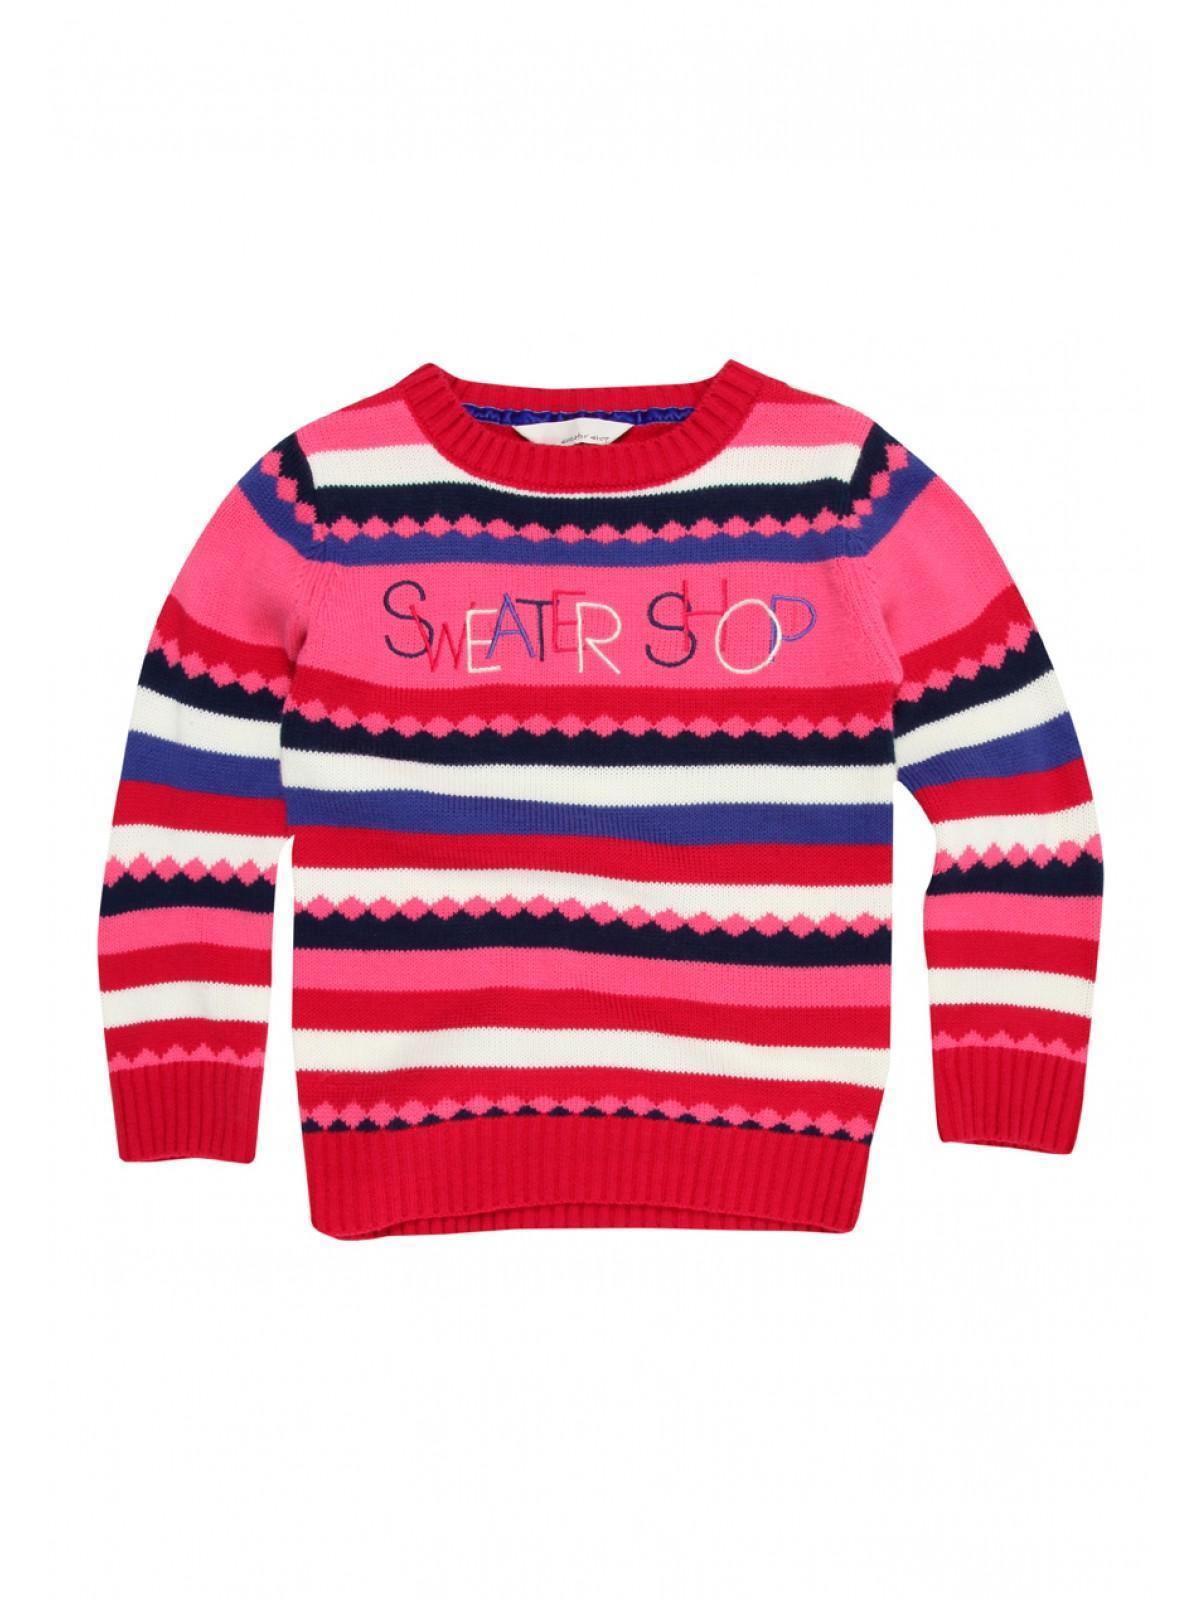 Girls Sweater Shop Girls Logo Crew Stripe Jumper | Peacocks